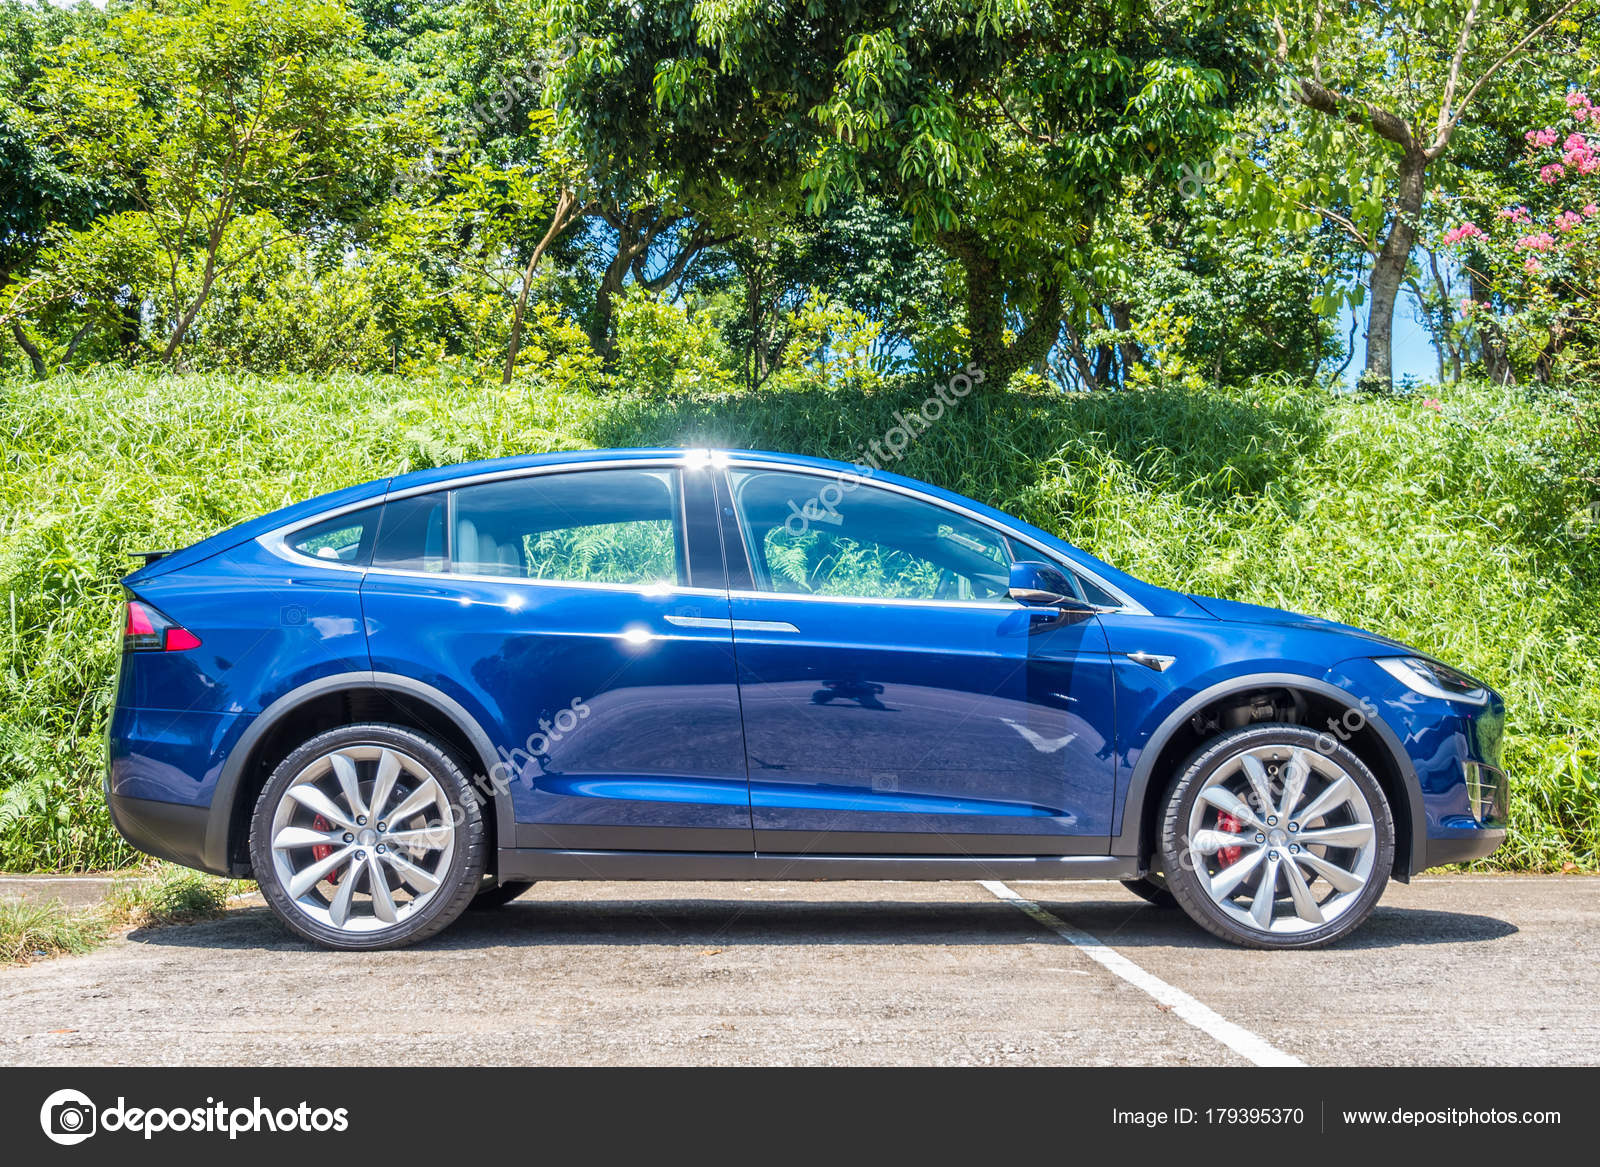 Tesla Model X 2017 Probefahrt Tag Redaktionelles Stockfoto